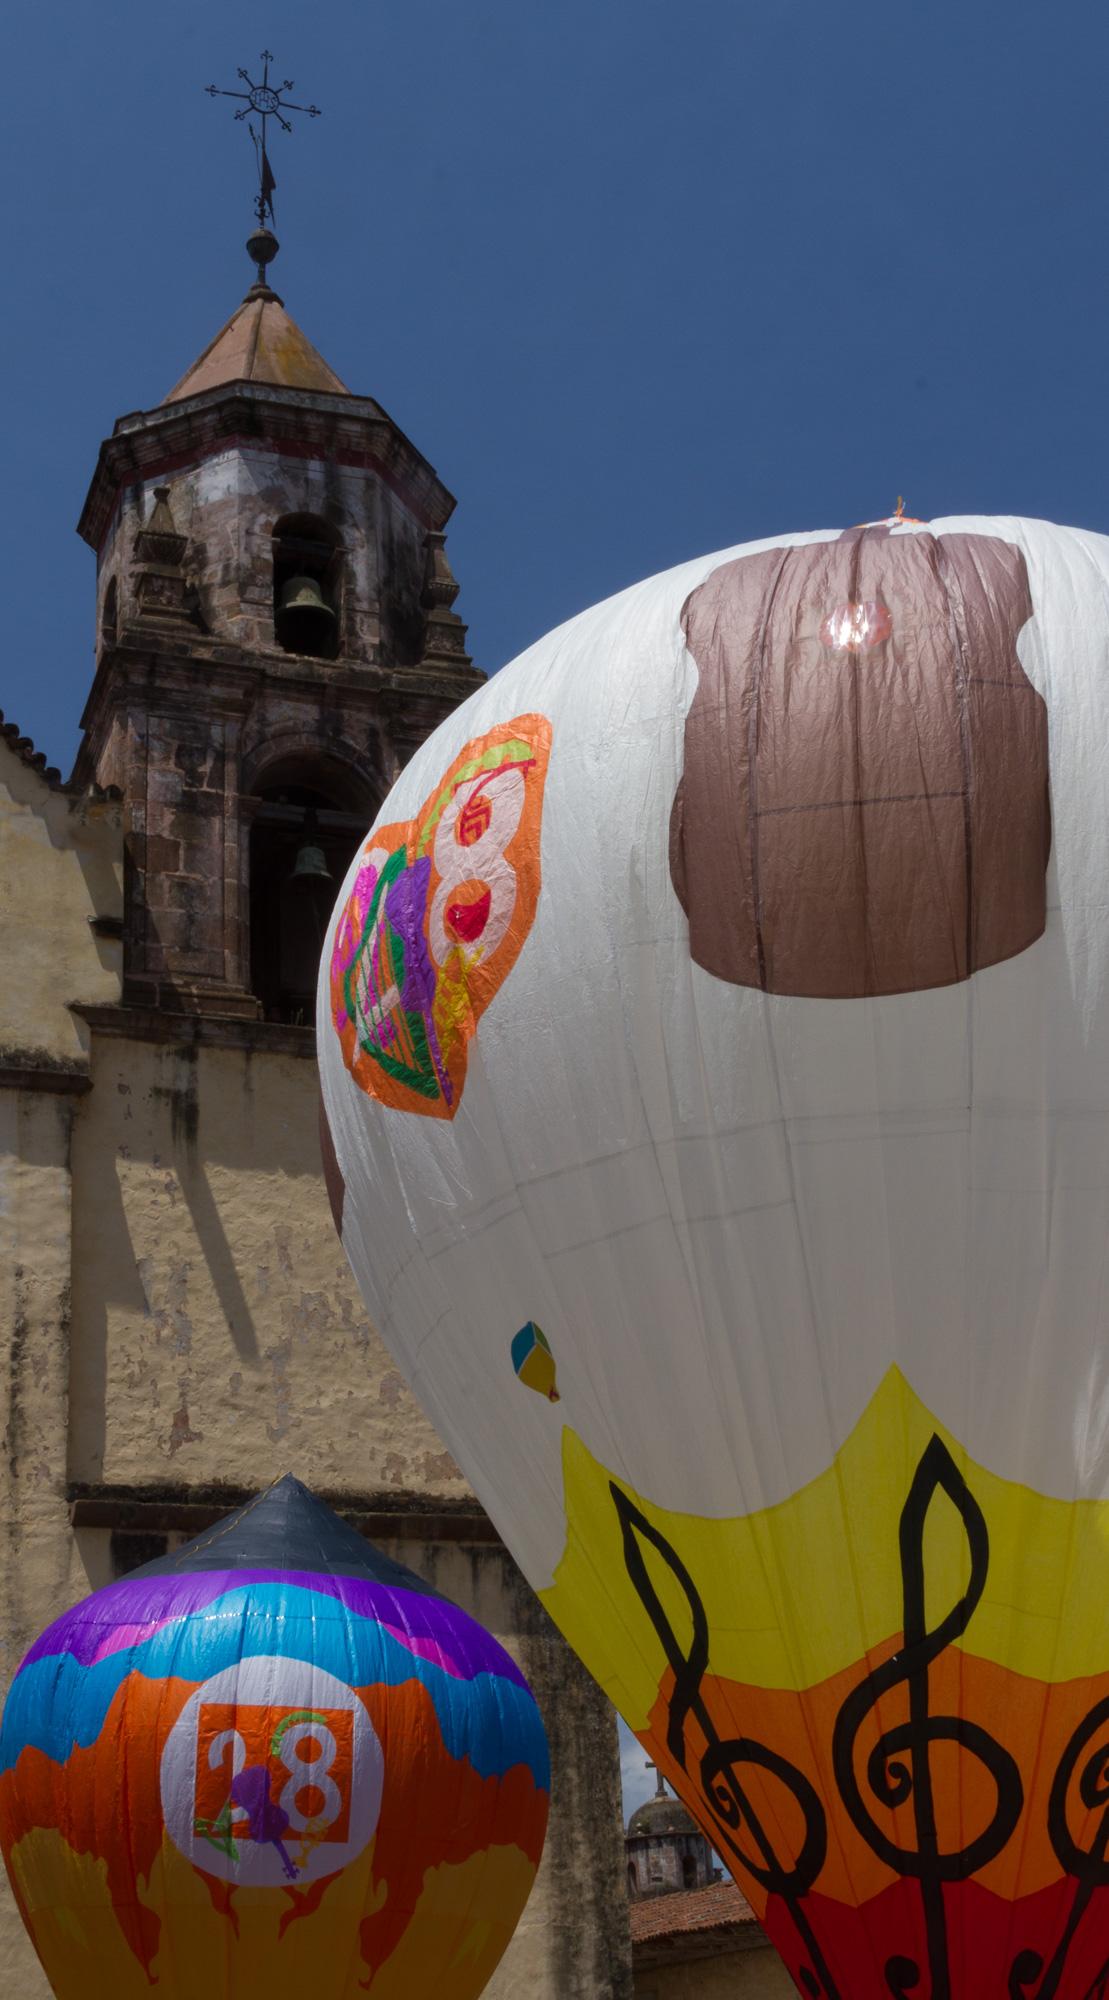 Church Music   CantoyaFest: Pátzcuaro, Michoacán, Mexico — Saturday, July 22, 2017